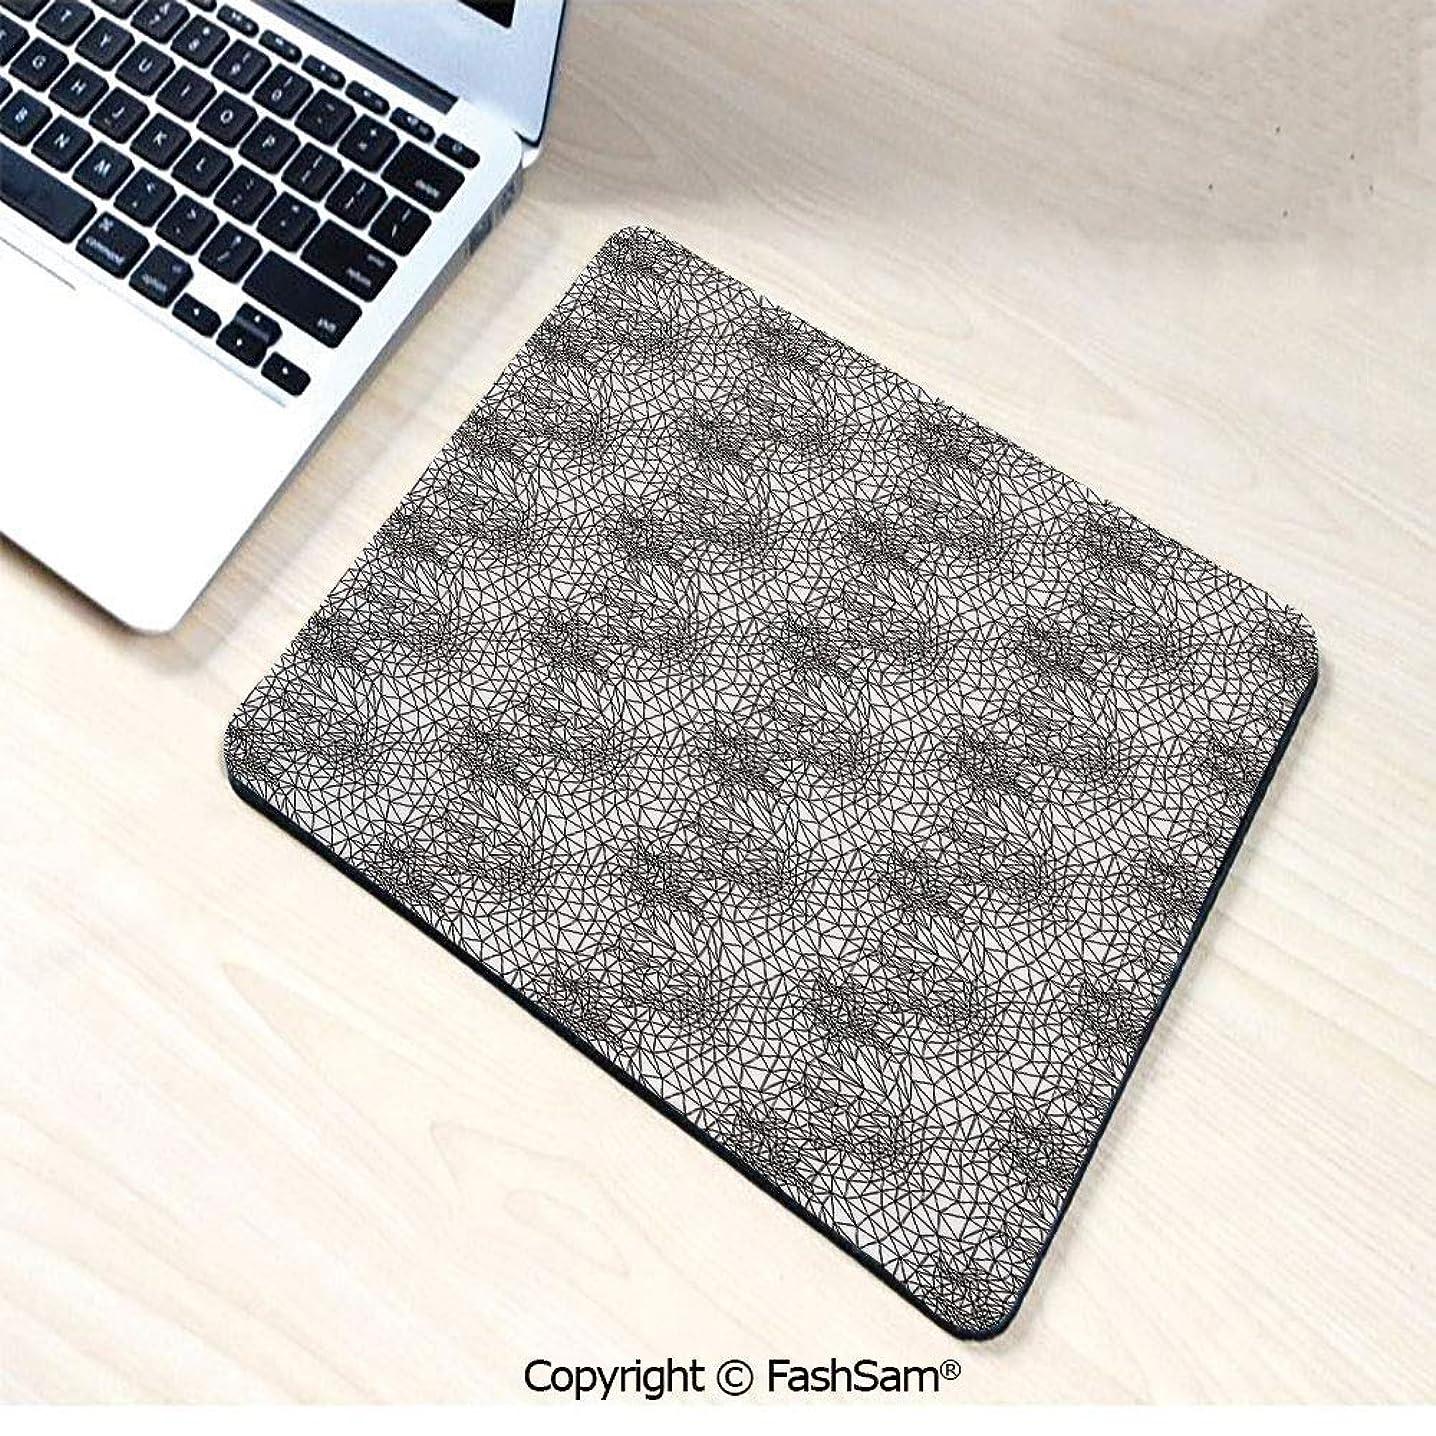 Personalized 3D Mouse Pad Monochrome Triangle Pattern Polygonal Design Connected Stripes Ornate Line Art Decorative for Laptop Desktop(W7.8xL9.45)